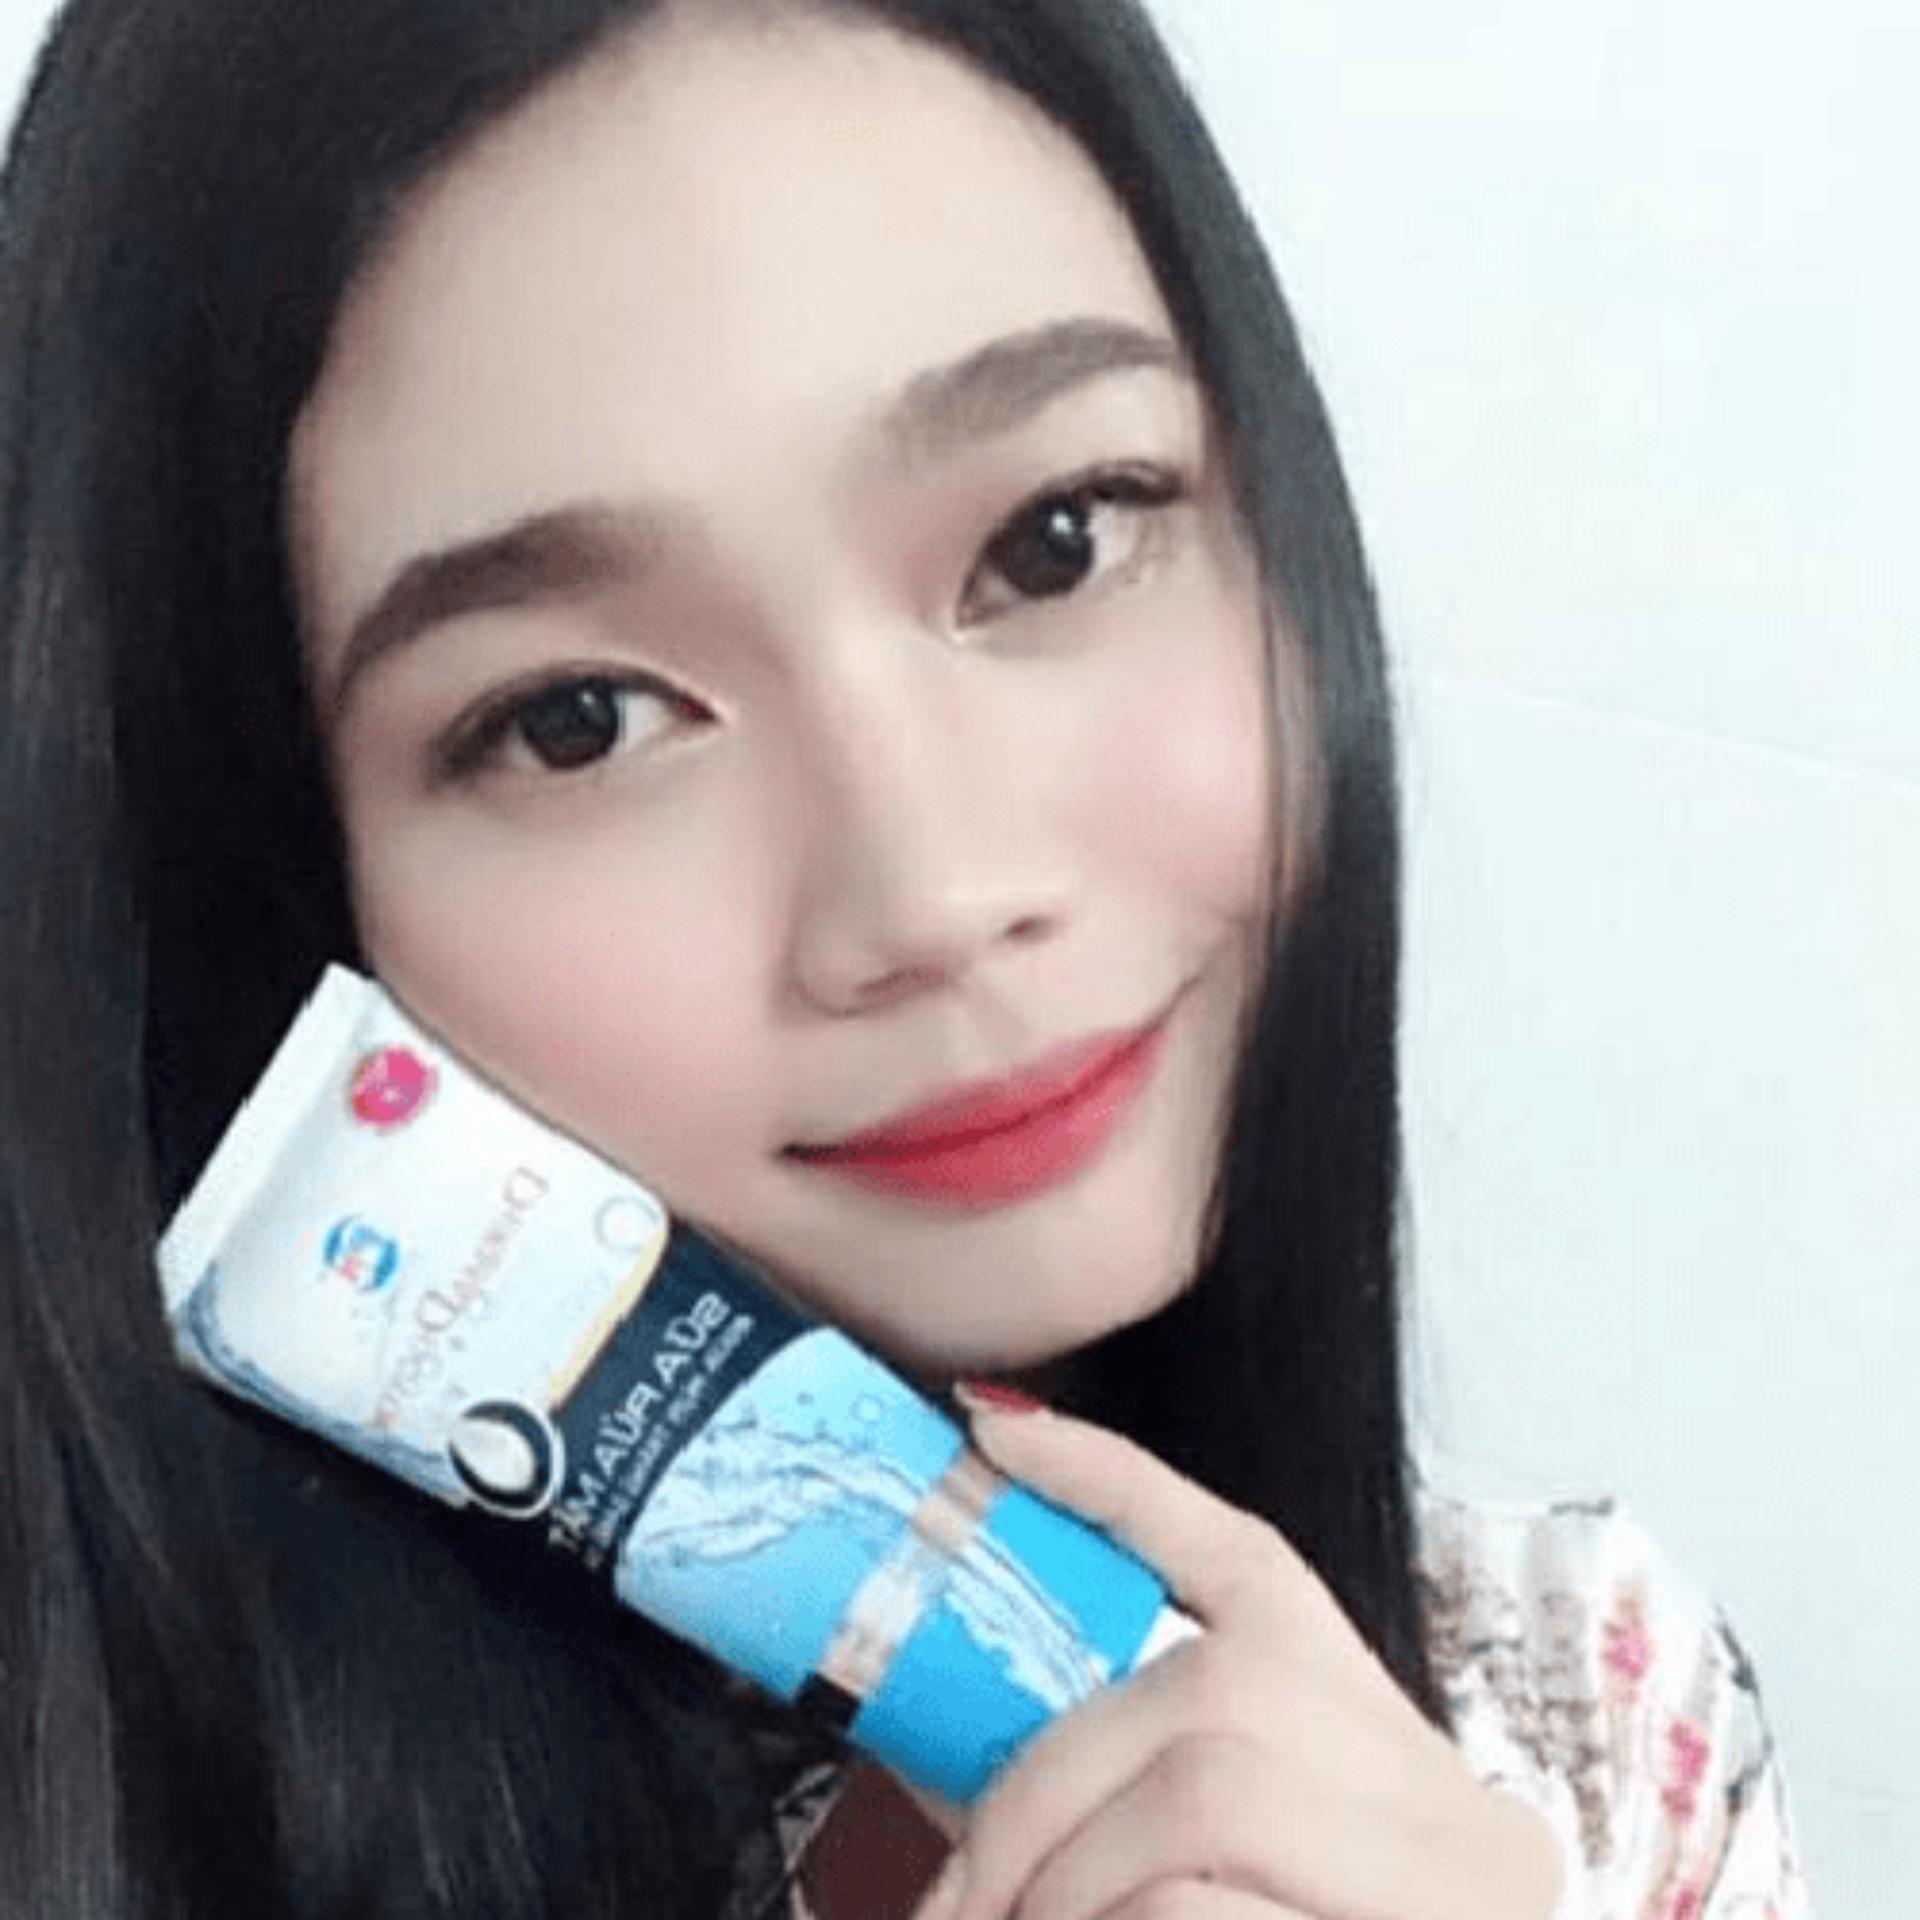 Derma Doctor Sữa Rữa Mặt Trắng Da, Ngừa Mụn (60ml) nhập khẩu